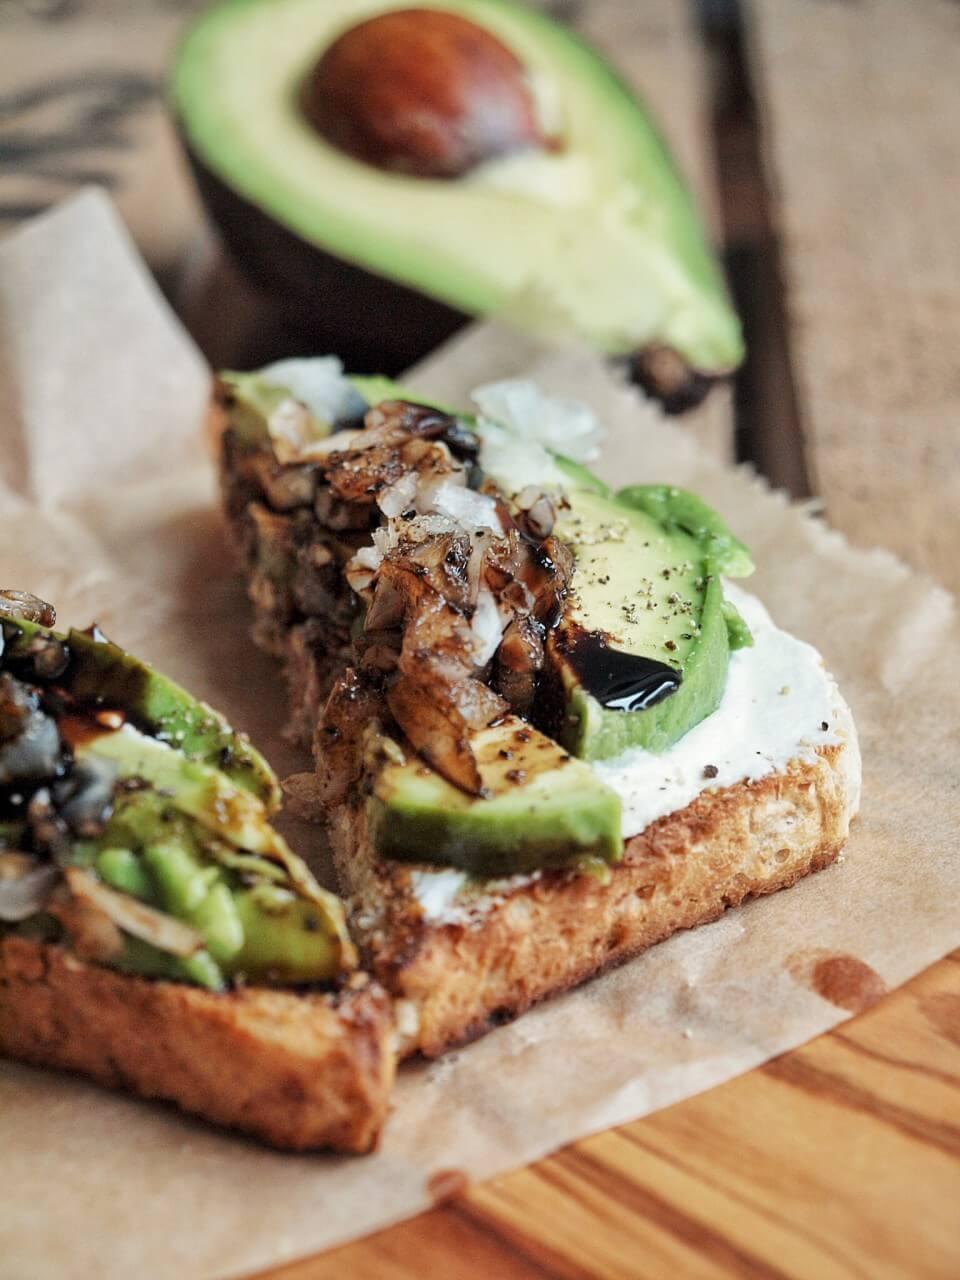 Rezept für Avocado Toast mit Frischkäse